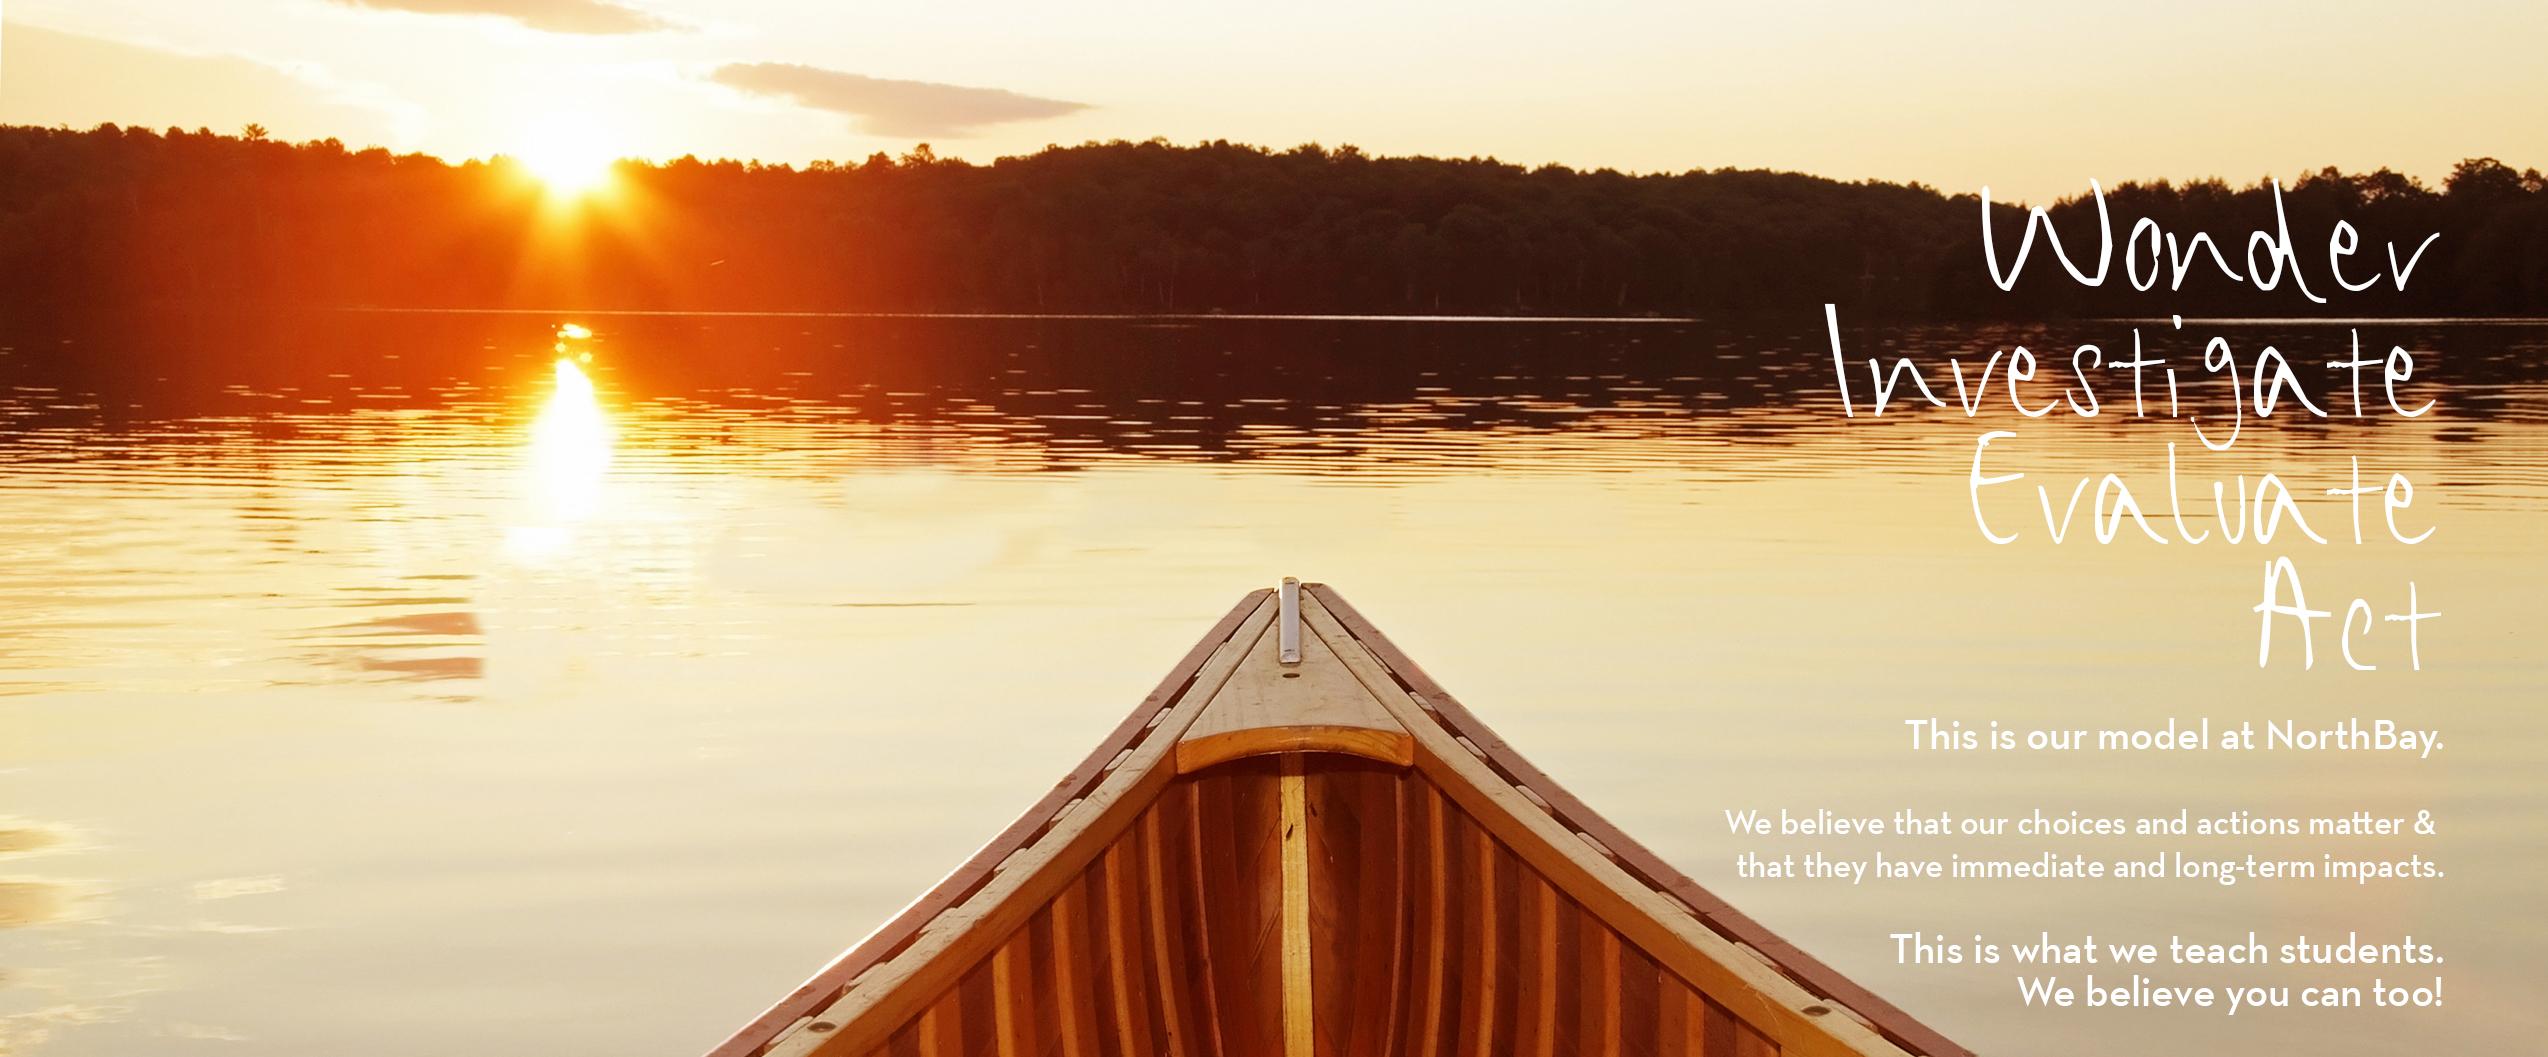 canoe-investigate